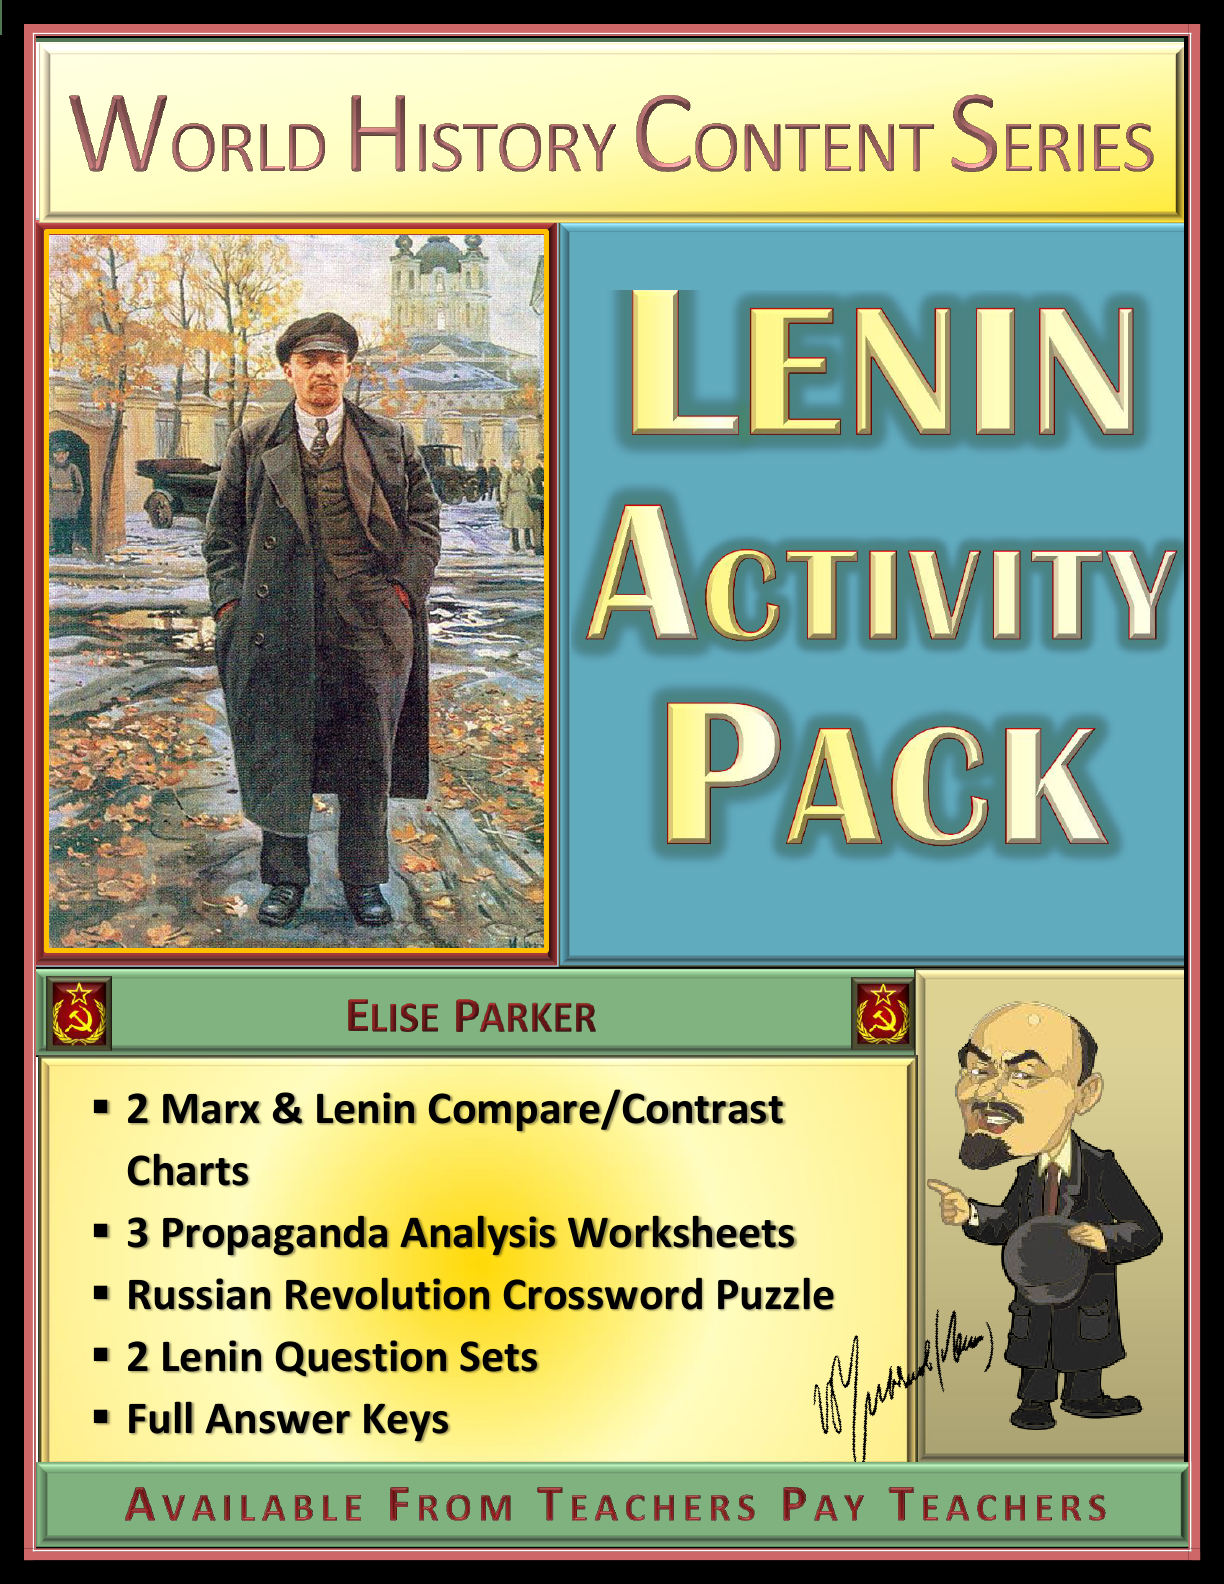 Lenin Activity Pack Charts Propaganda Worksheets